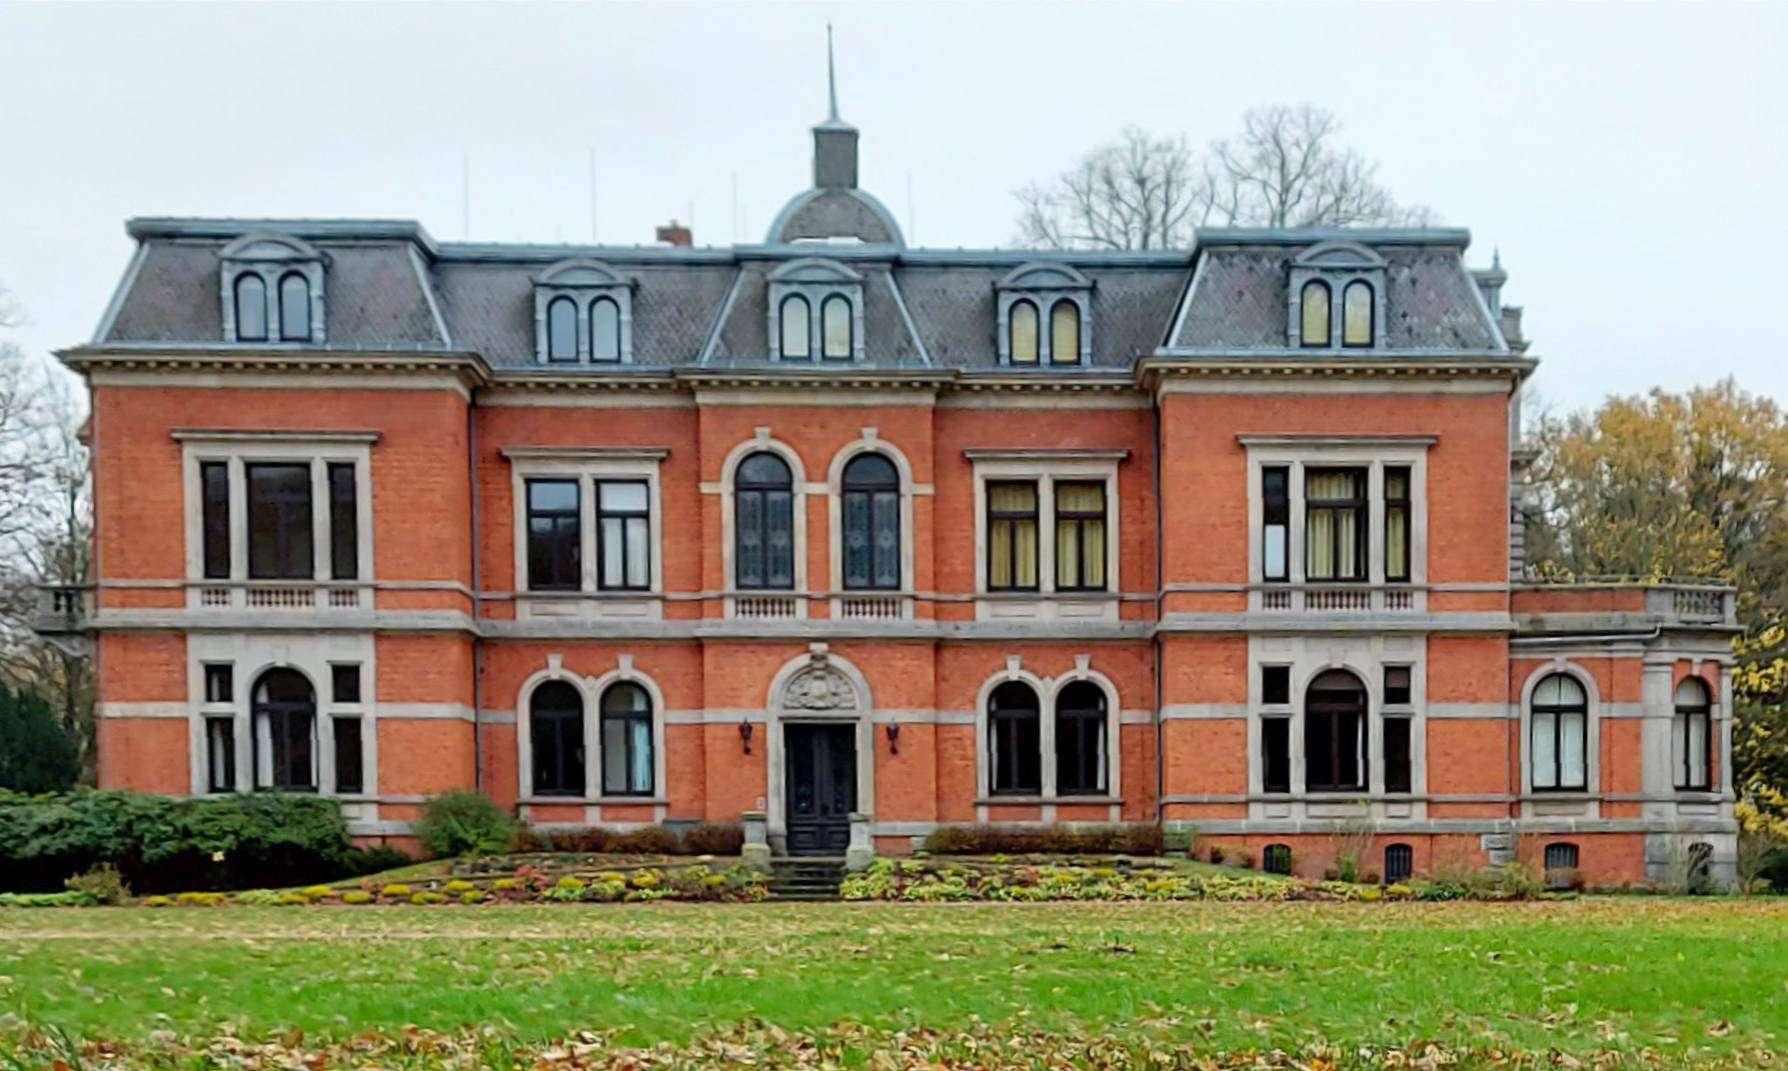 Nach kurzem Leerstand kann Schloss Etelsen ab 1. April einen neuen Mieter präsentieren.  Foto: Dennis Bartz